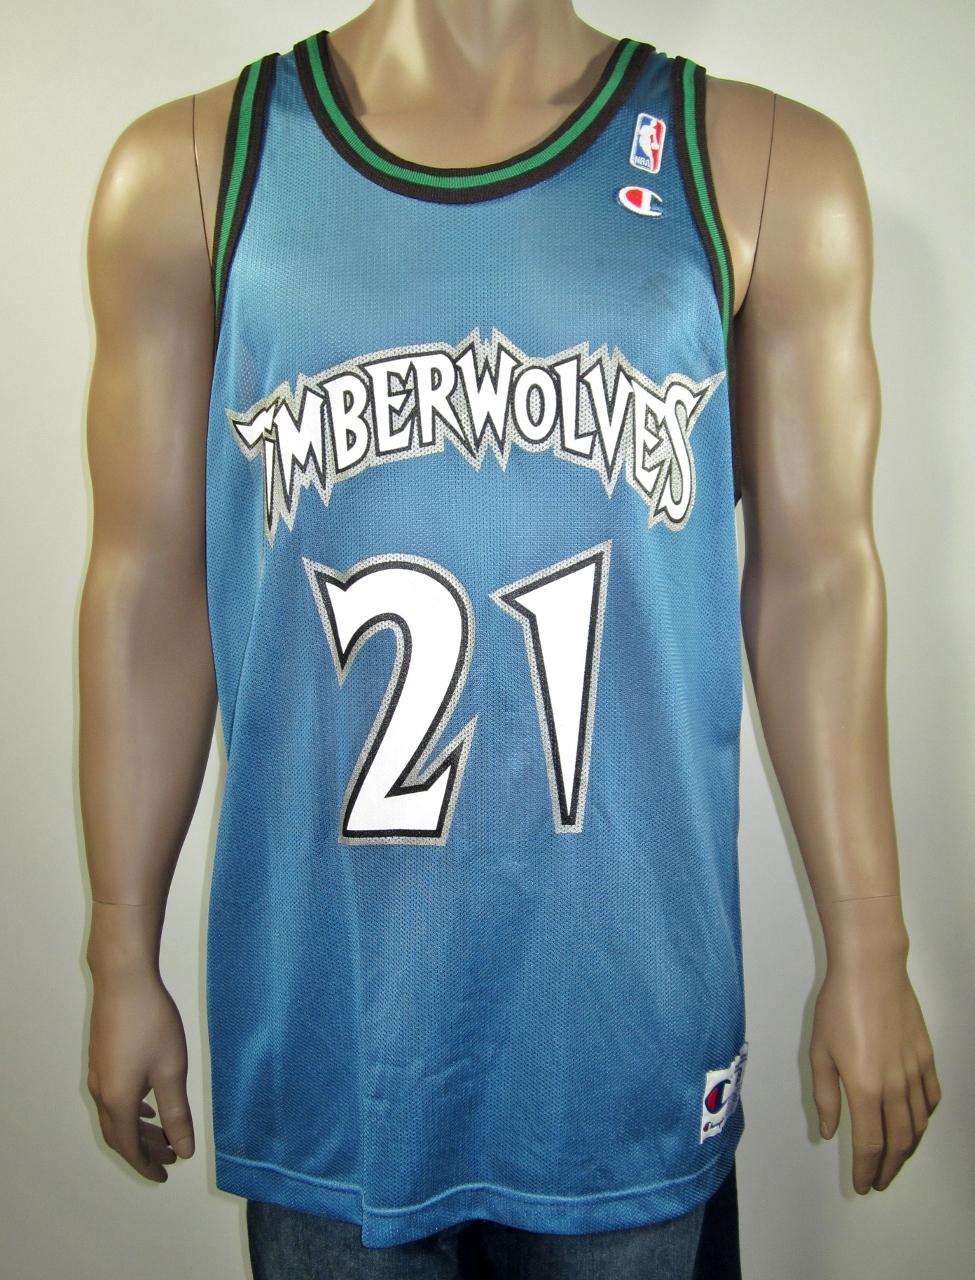 sale retailer eeda5 5fad5 Kevin Garnett Minnesota Timberwolves Champion Jersey 48 NWT from DFRNSH8